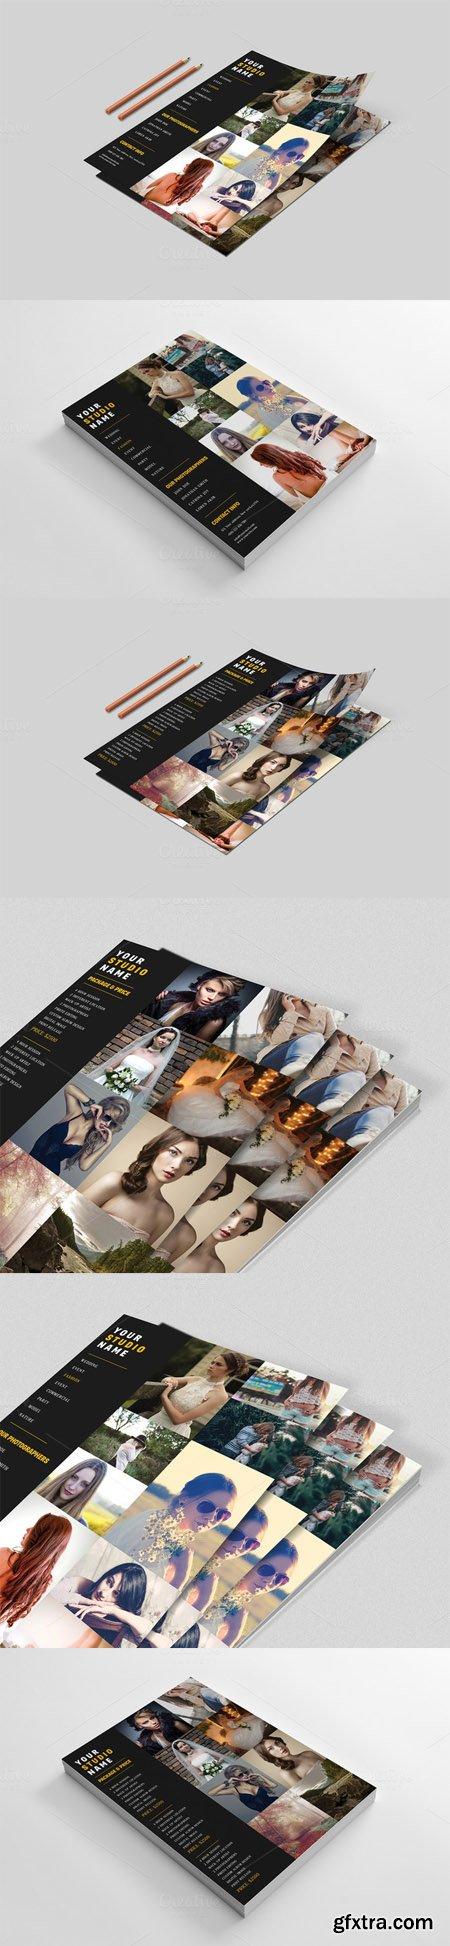 CM - Photography Price List Flyer 499973